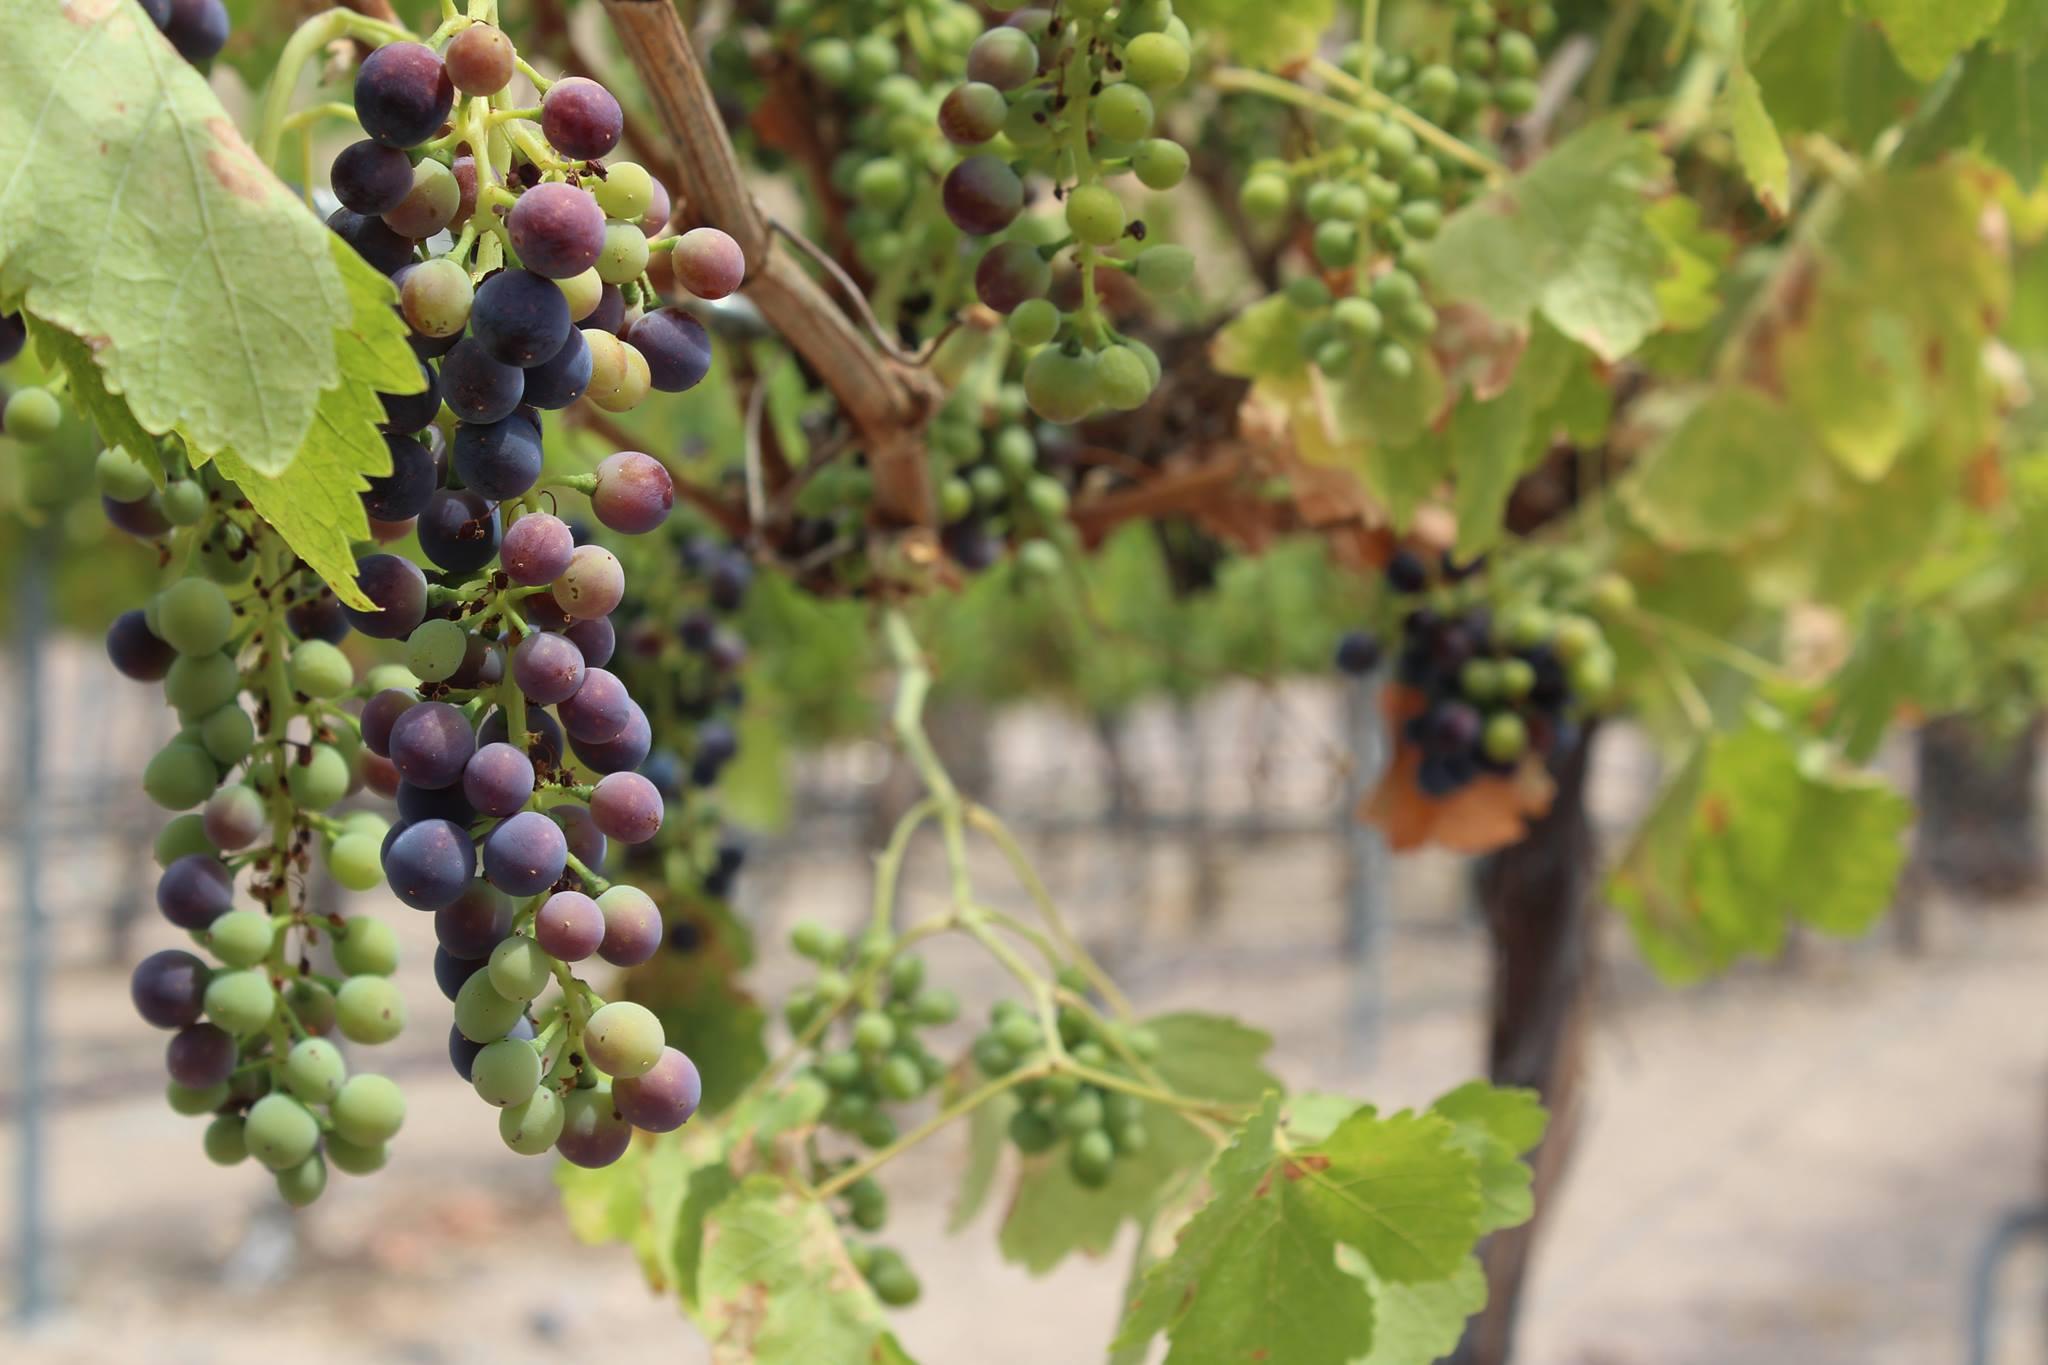 Oak Creek Vineyards and Winery